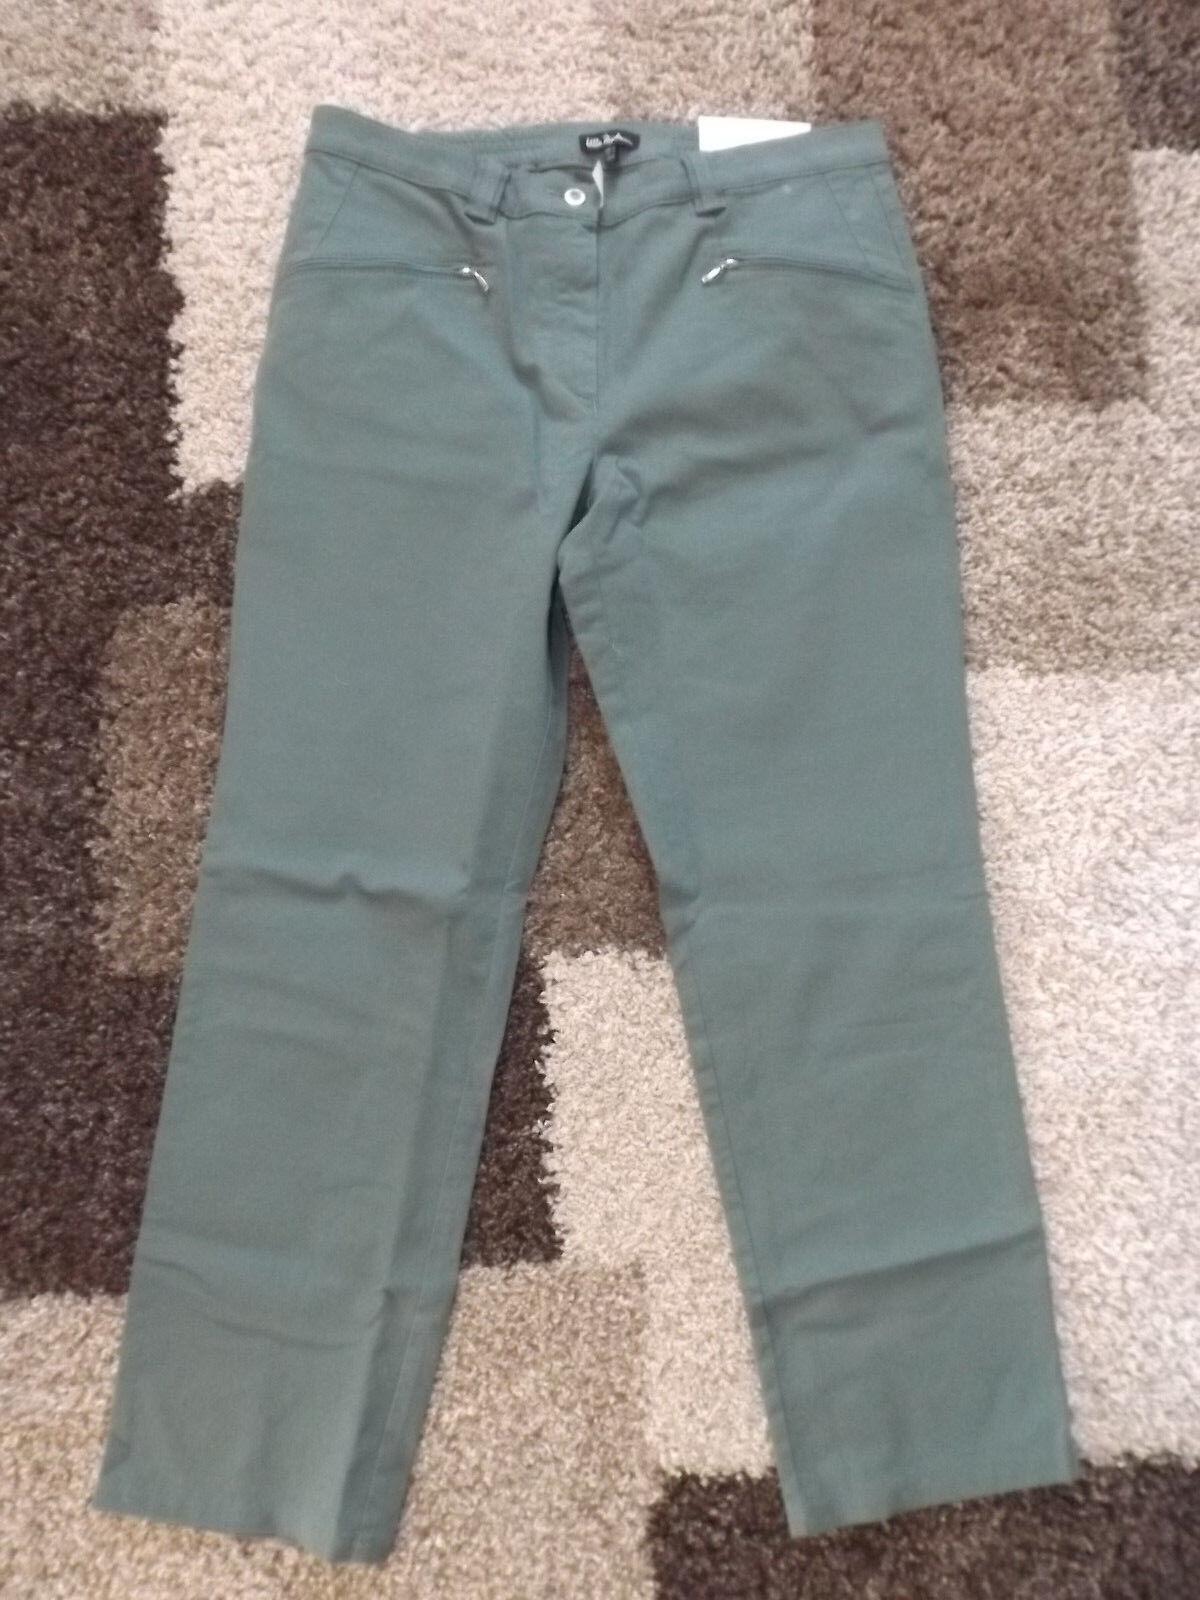 ULLA POPKEN  23 (46 kurz) green  Jeans Hose MONY  gerades Bein